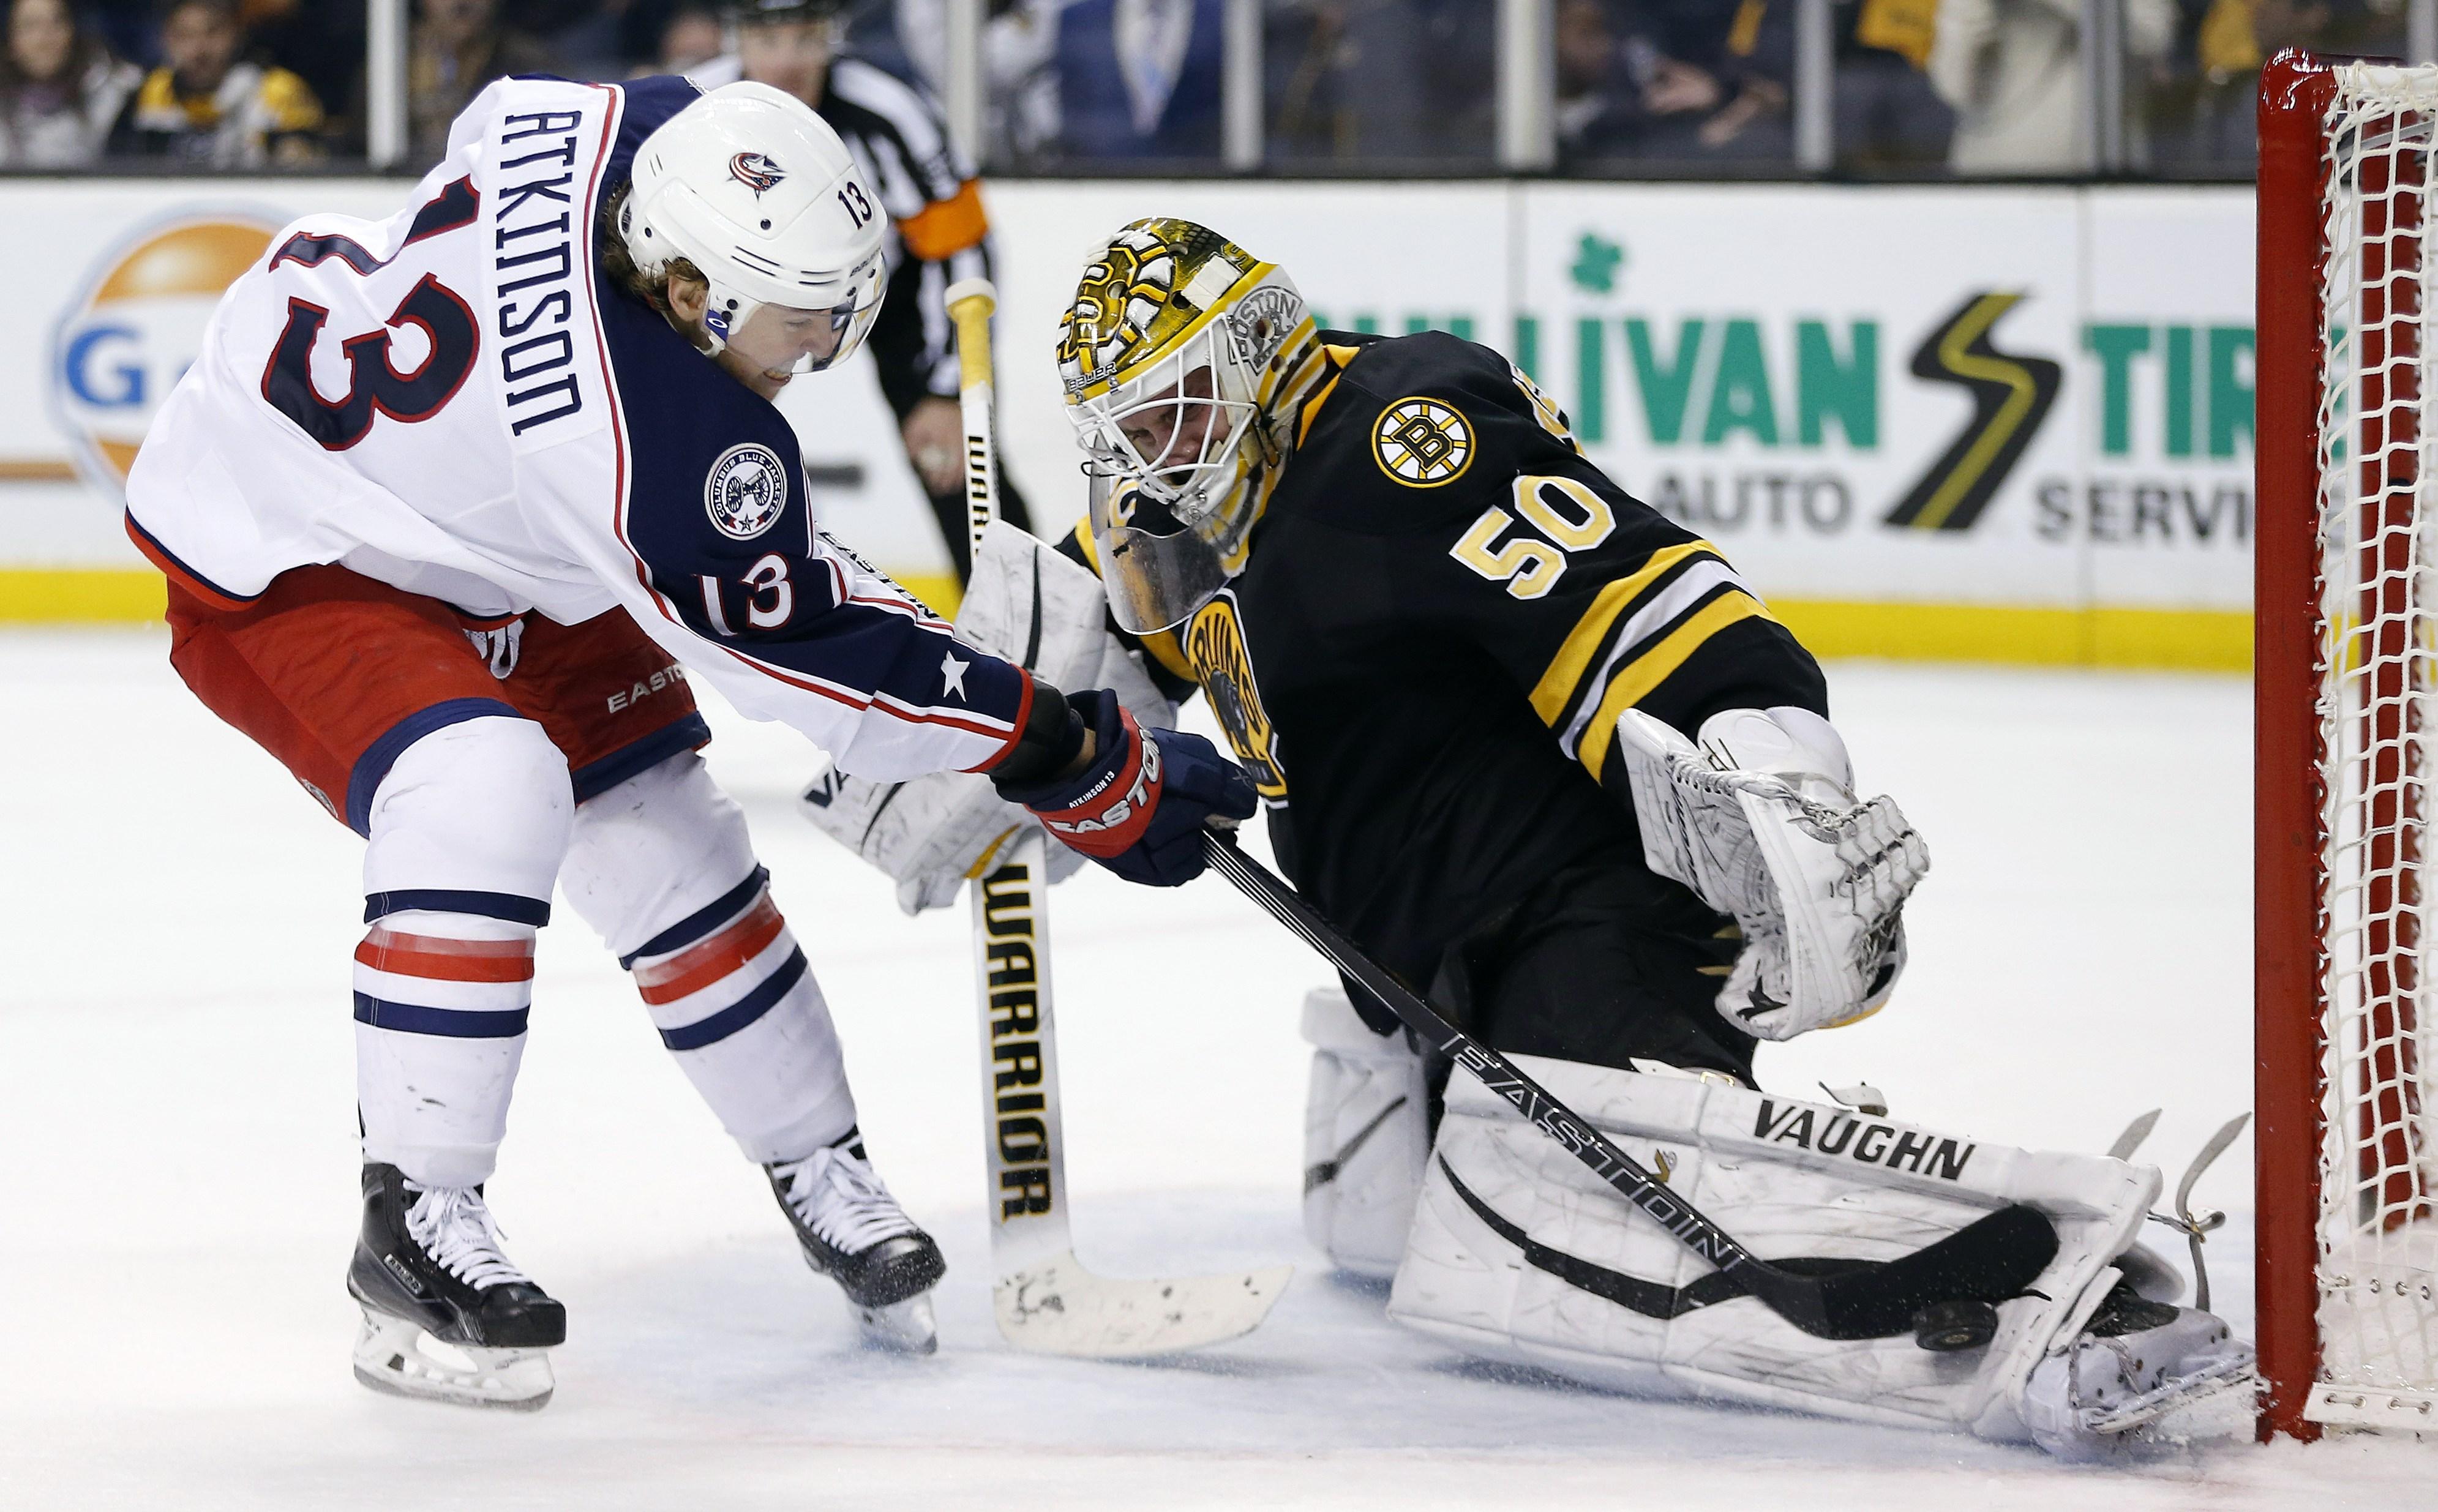 Boston Bruins' Jonas Gustavsson (50) blocks a shot by Columbus Blue Jackets' Cam Atkinson (13) during the shootout in an NHL hockey game in Boston, Saturday, Jan. 23, 2016. The Bruins won 3-2. (AP Photo/Michael Dwyer)